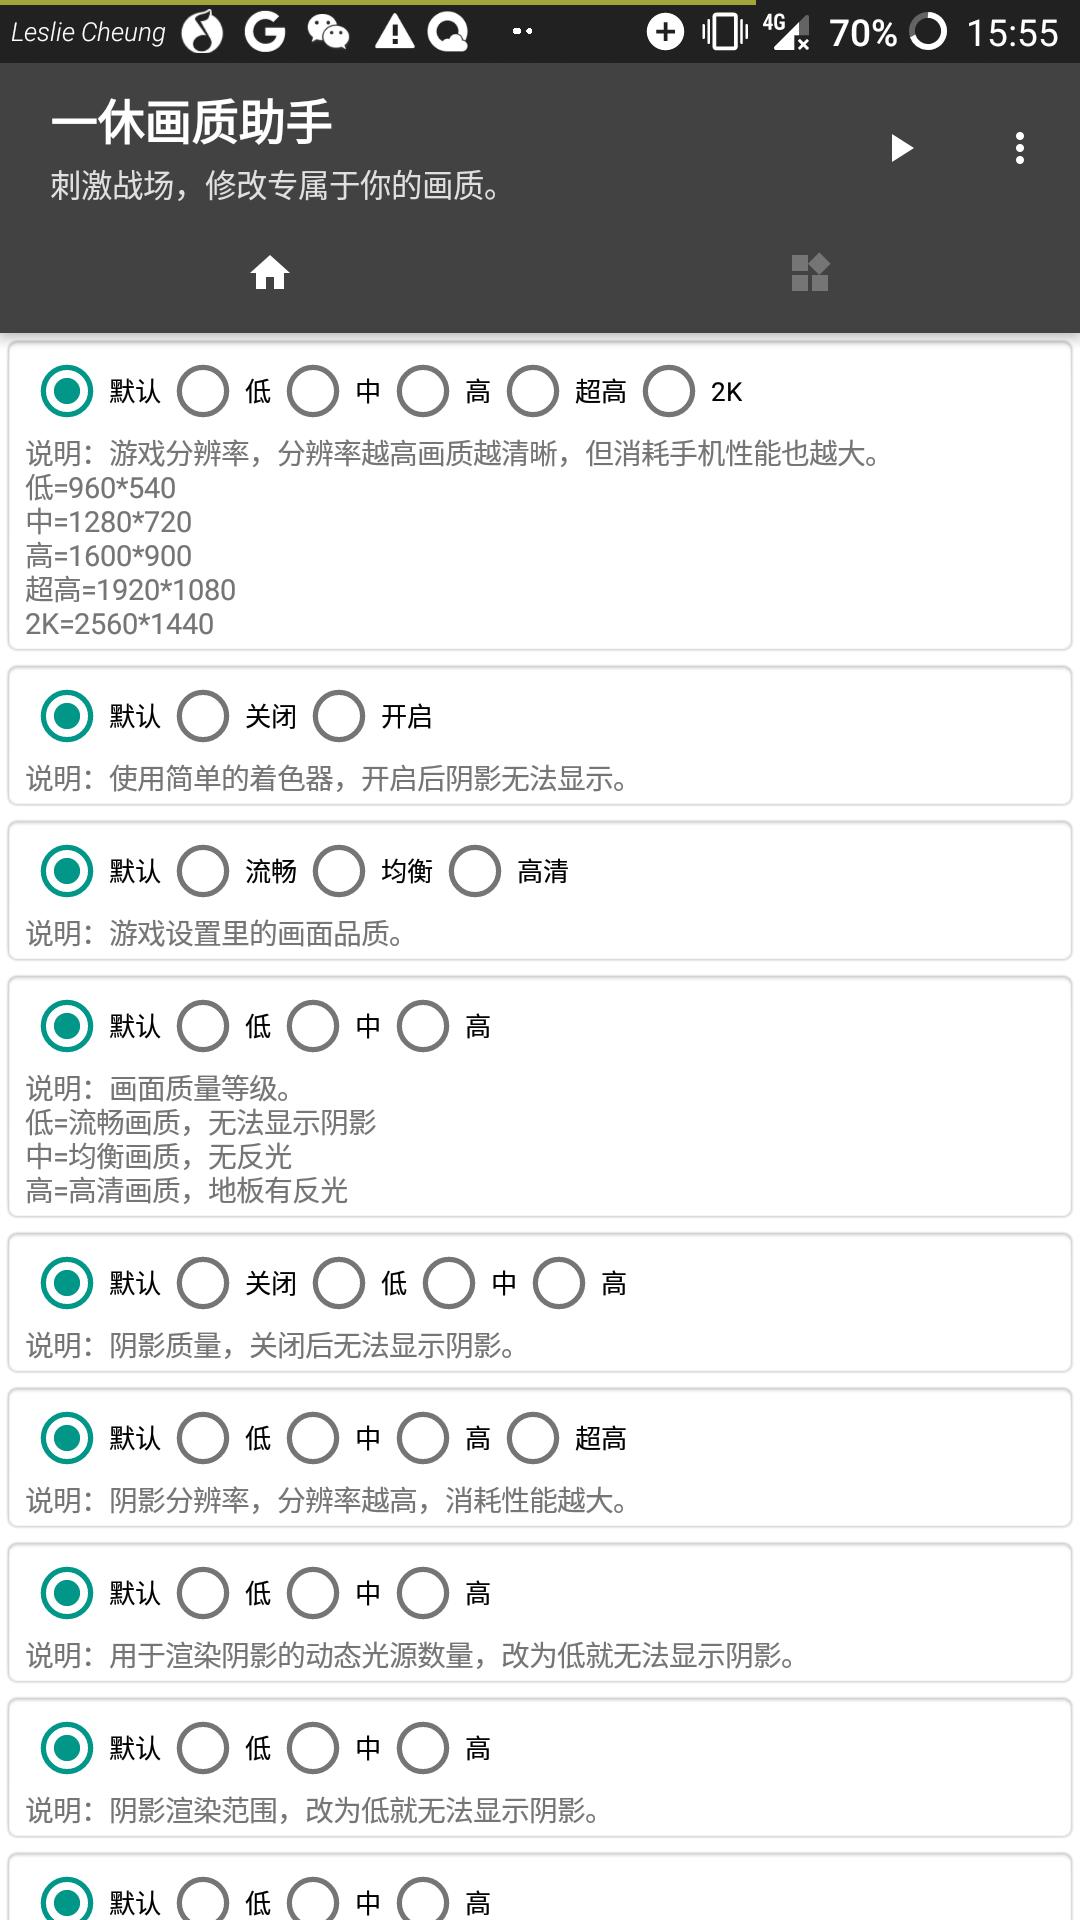 Screenshot_一休画质助手_20180627-155531.png